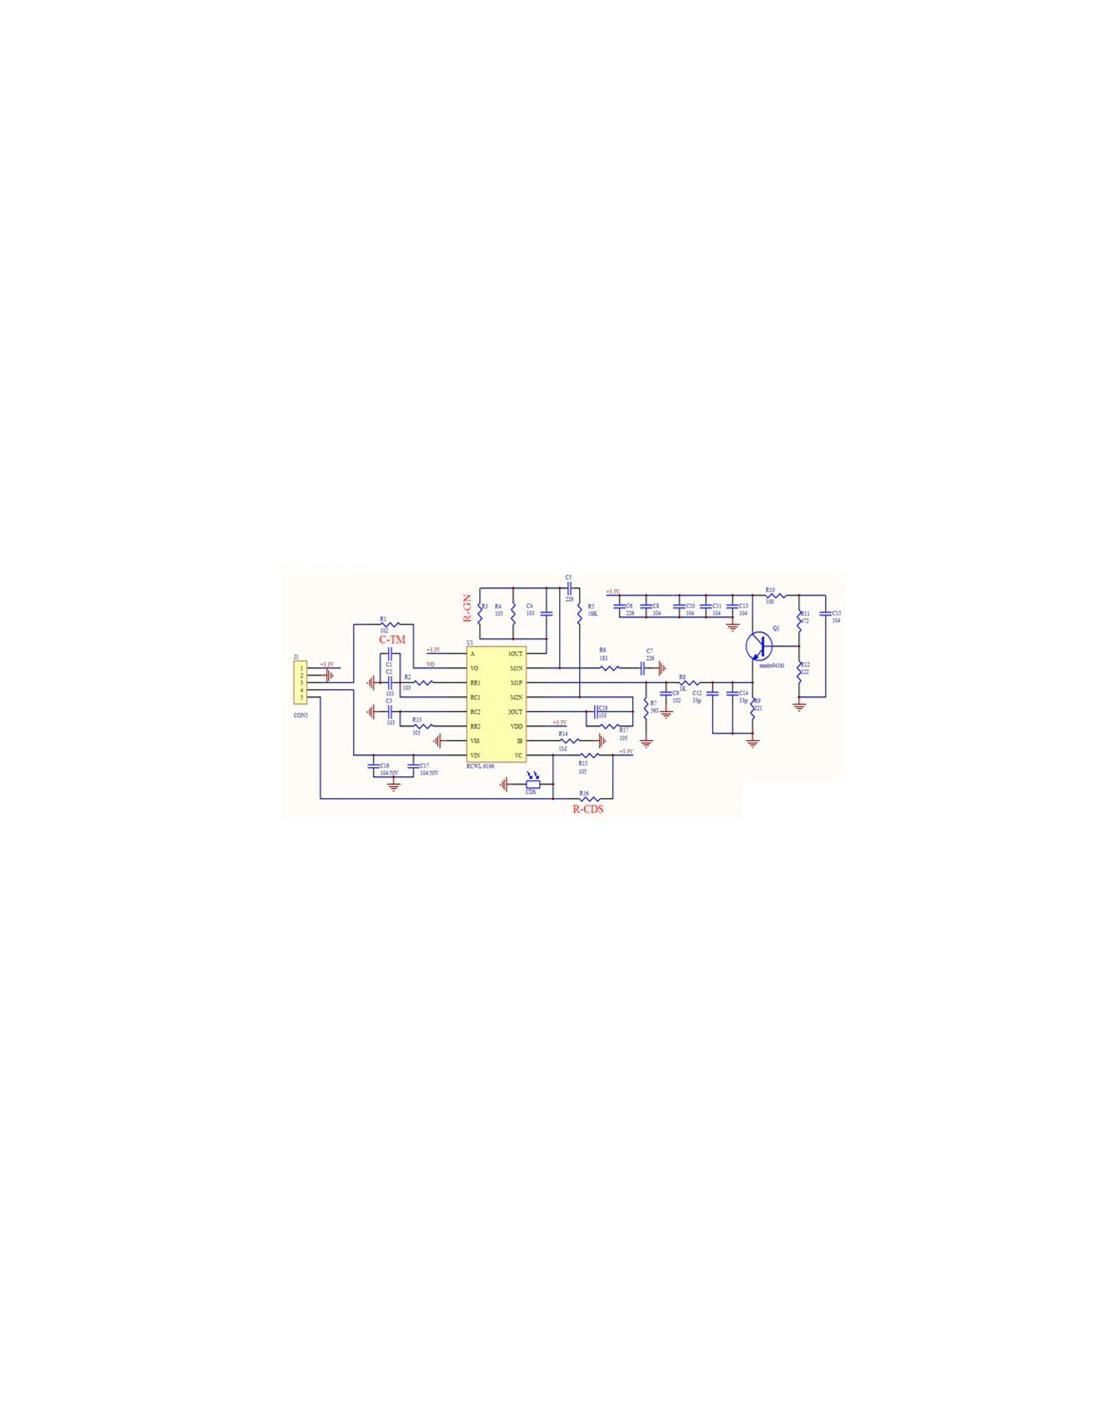 RCWL 0516 Microwave Motion Sensor Module Radar Sensor Body Induction